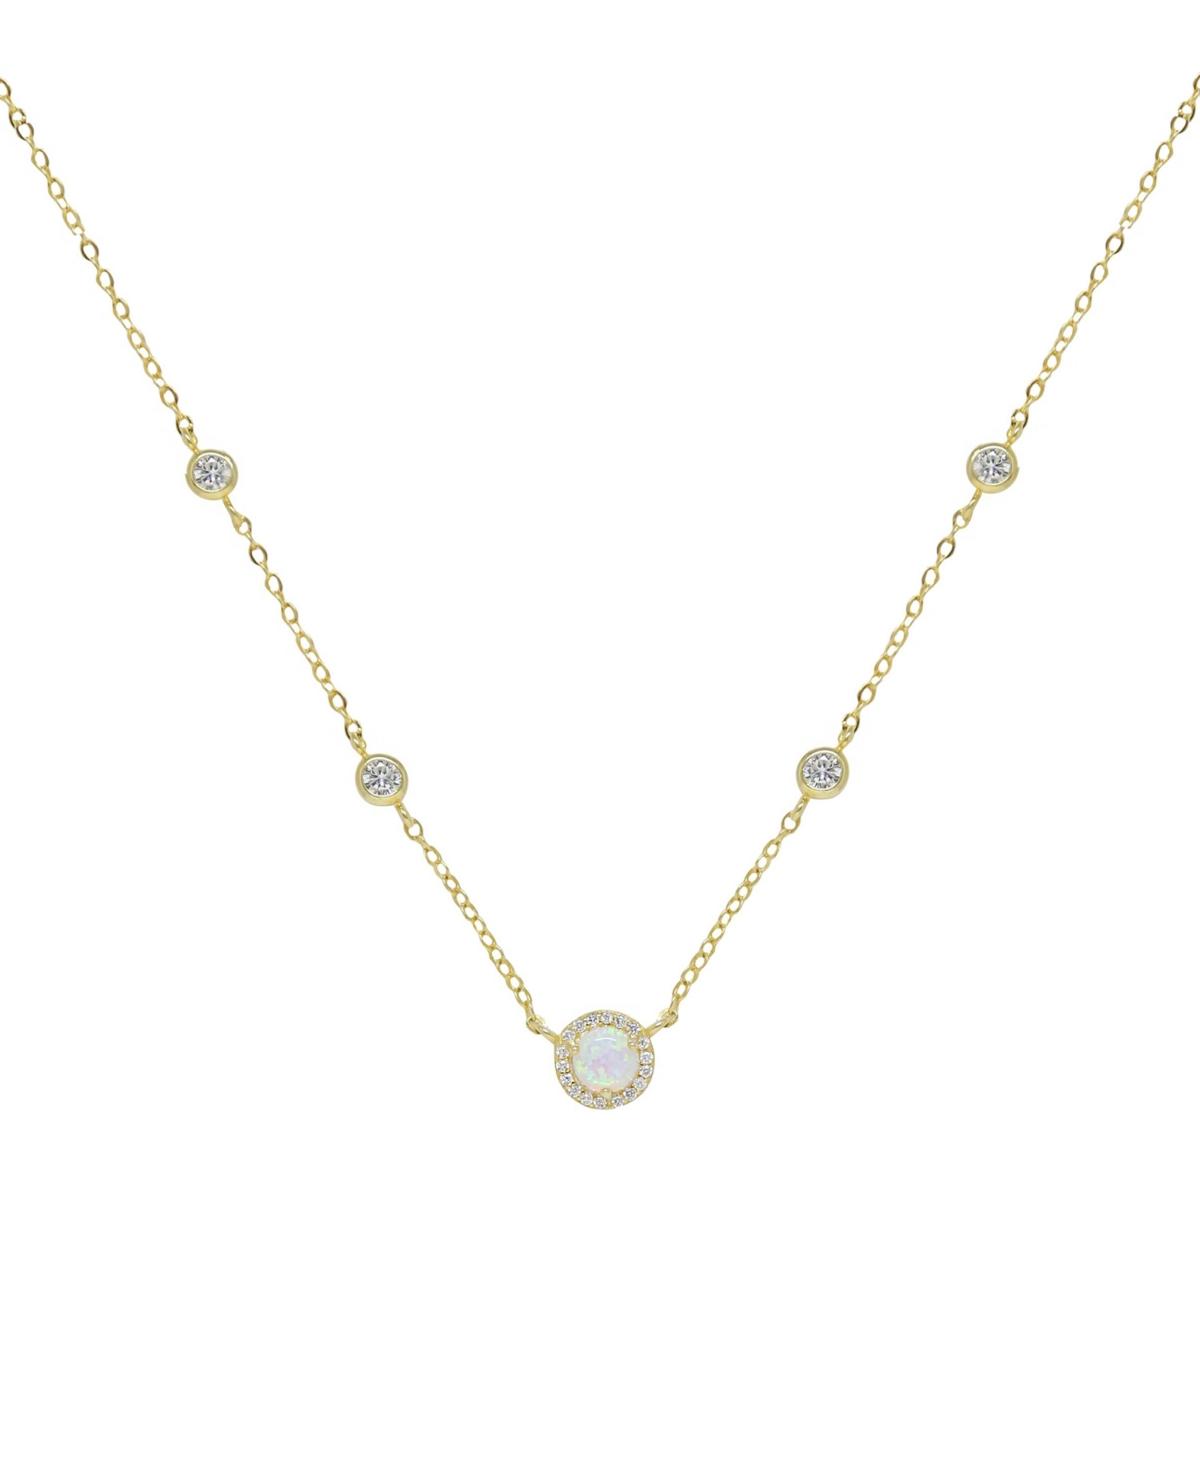 Ettika Olivia Opal and Crystal Necklace